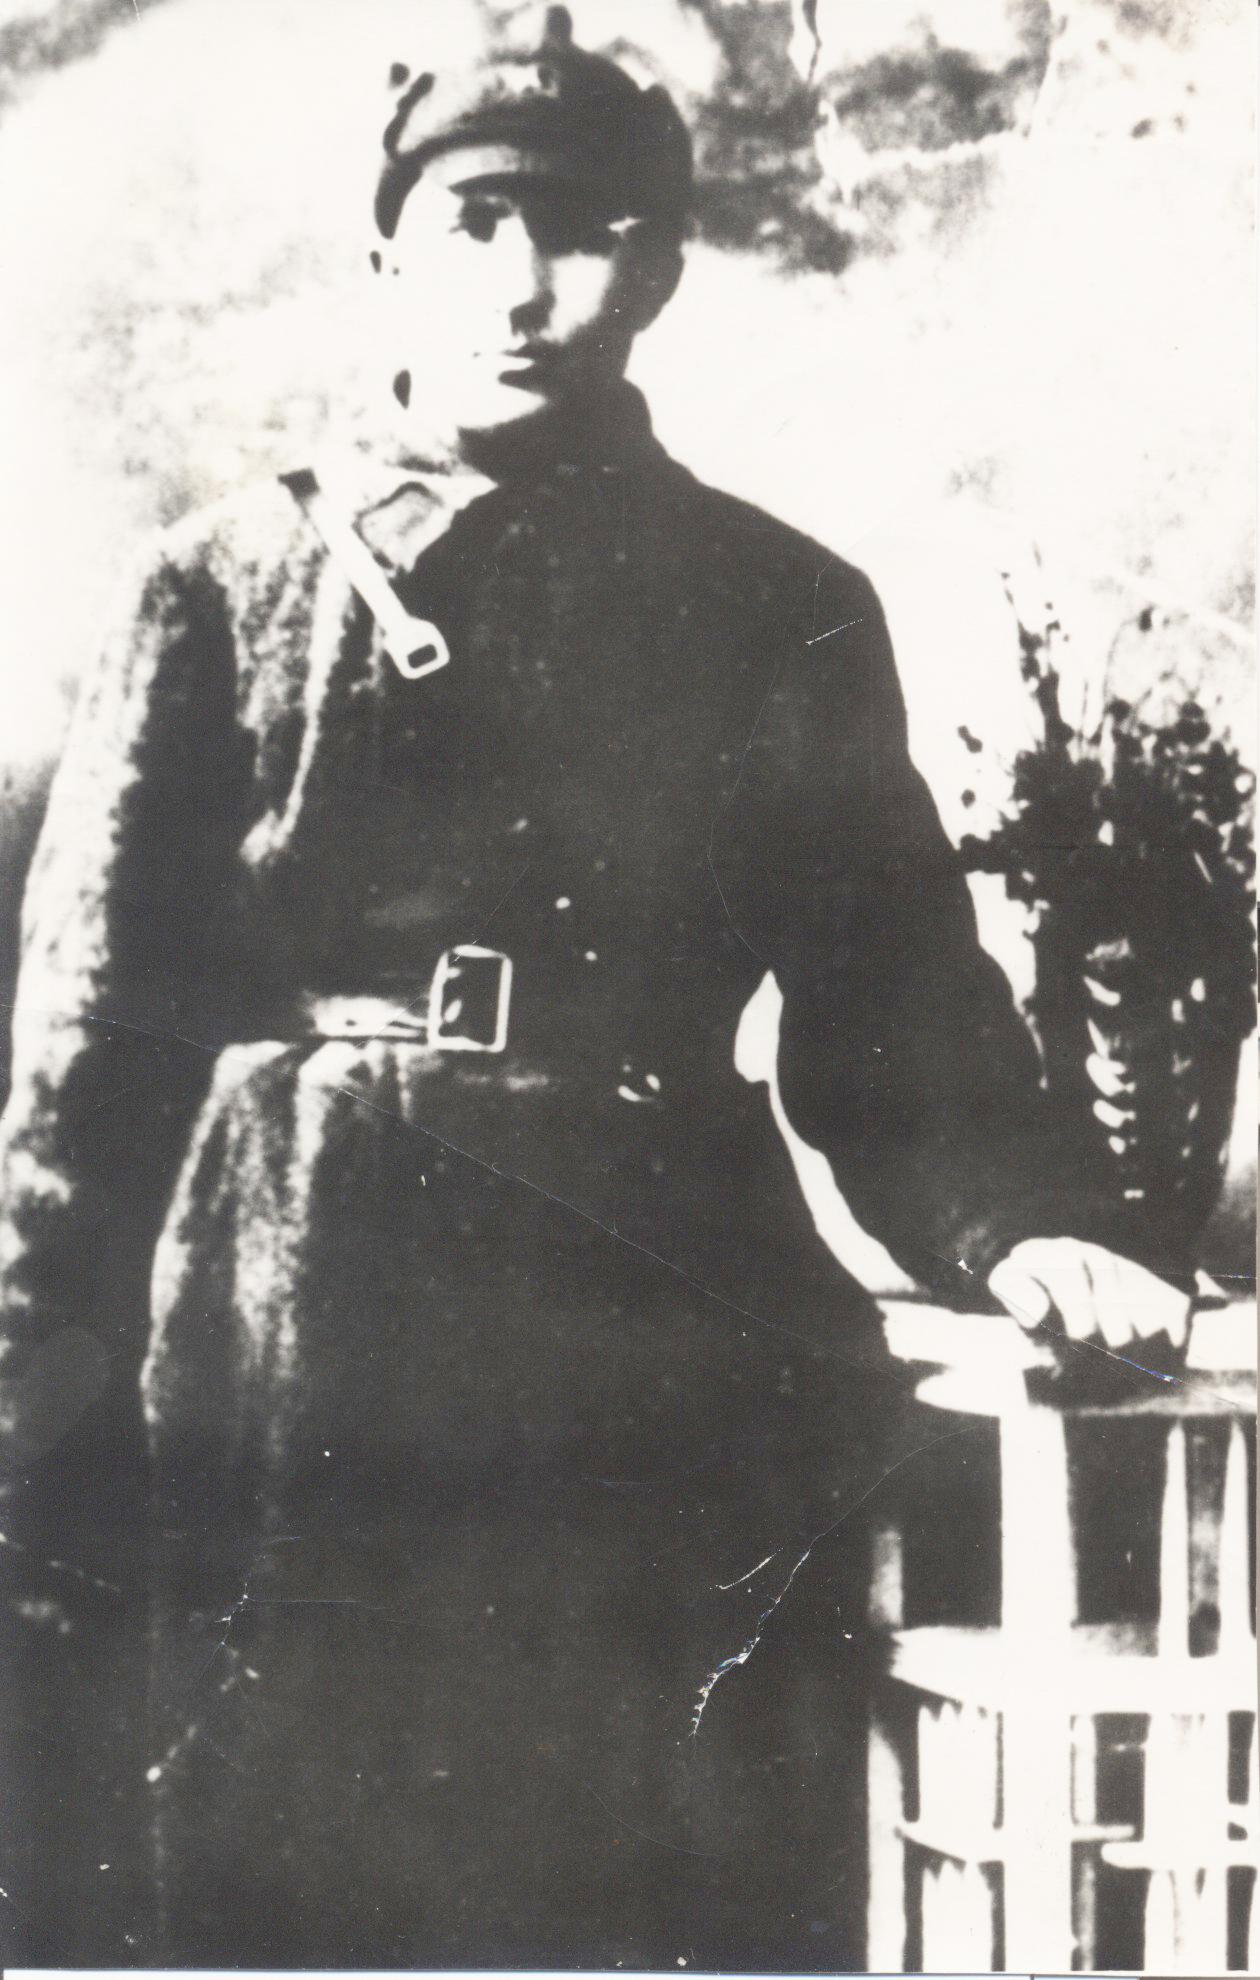 Басов Даниил Кузьмич 1914 — 1941